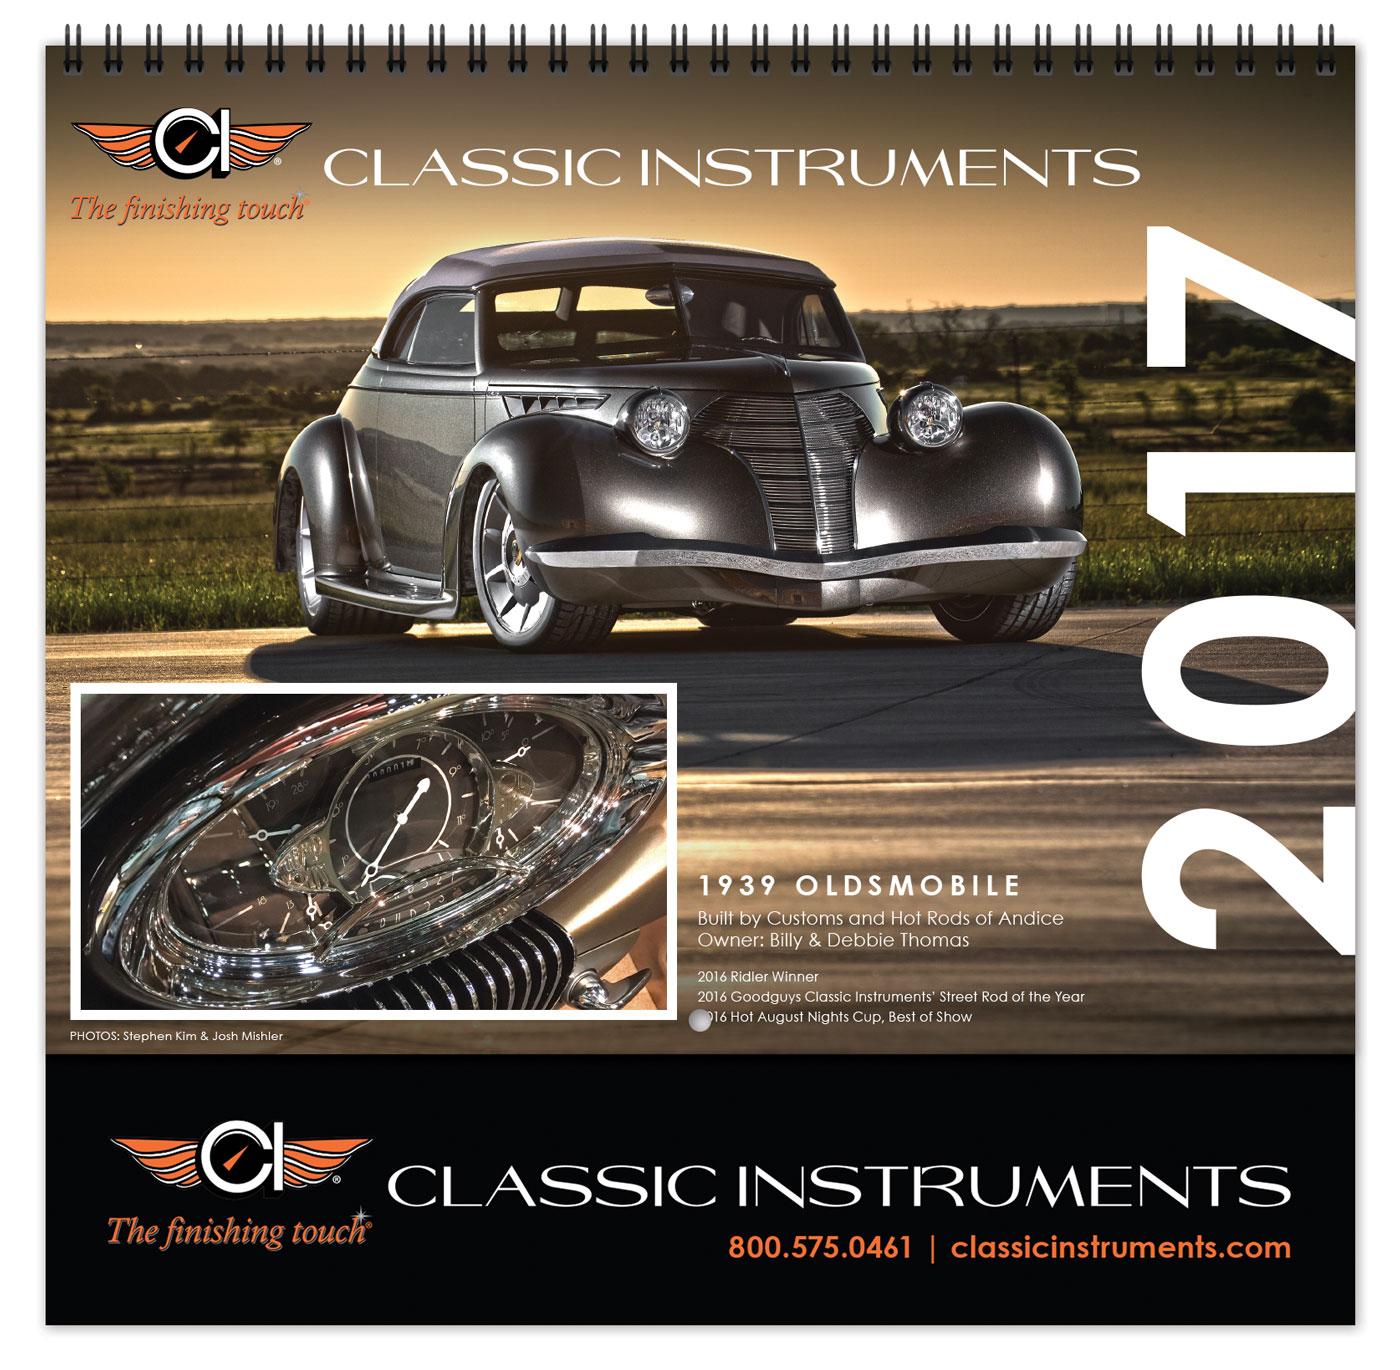 classic instruments custom calendar